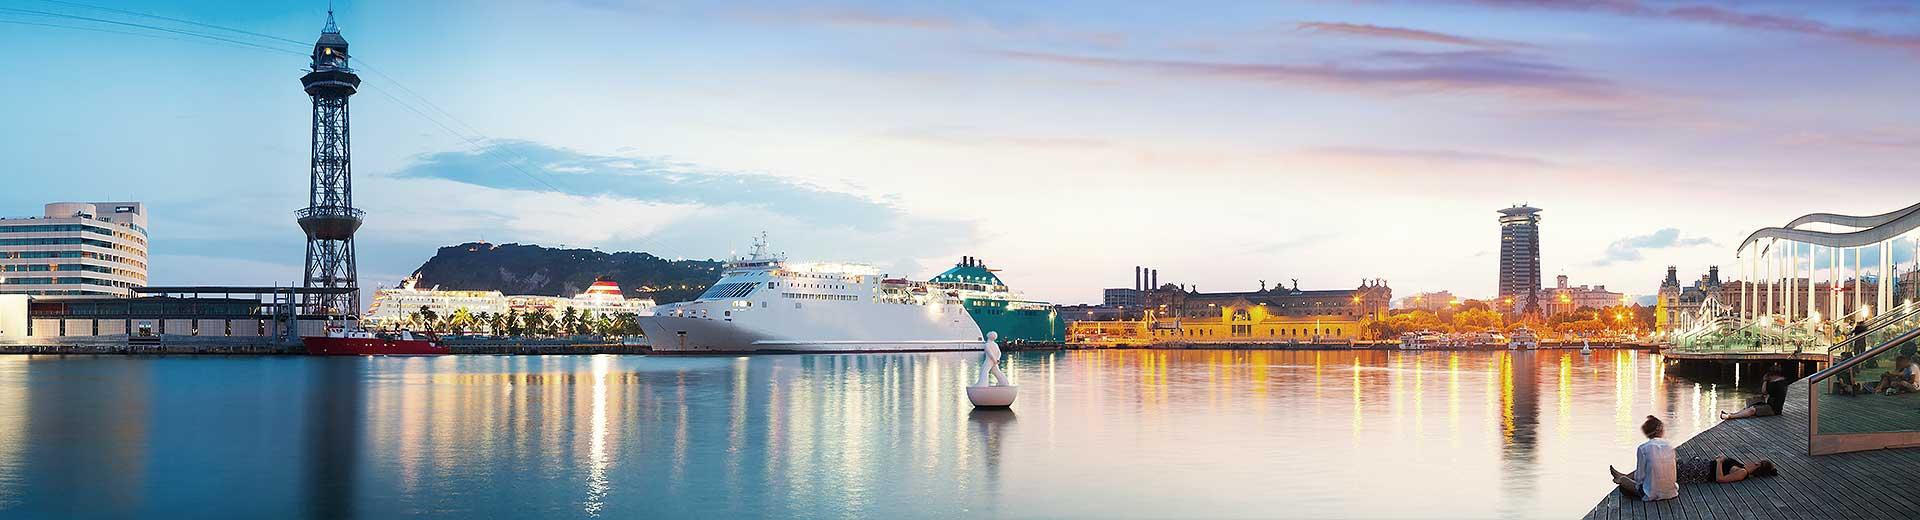 Voyages en groupe Barcelone - offre Confort